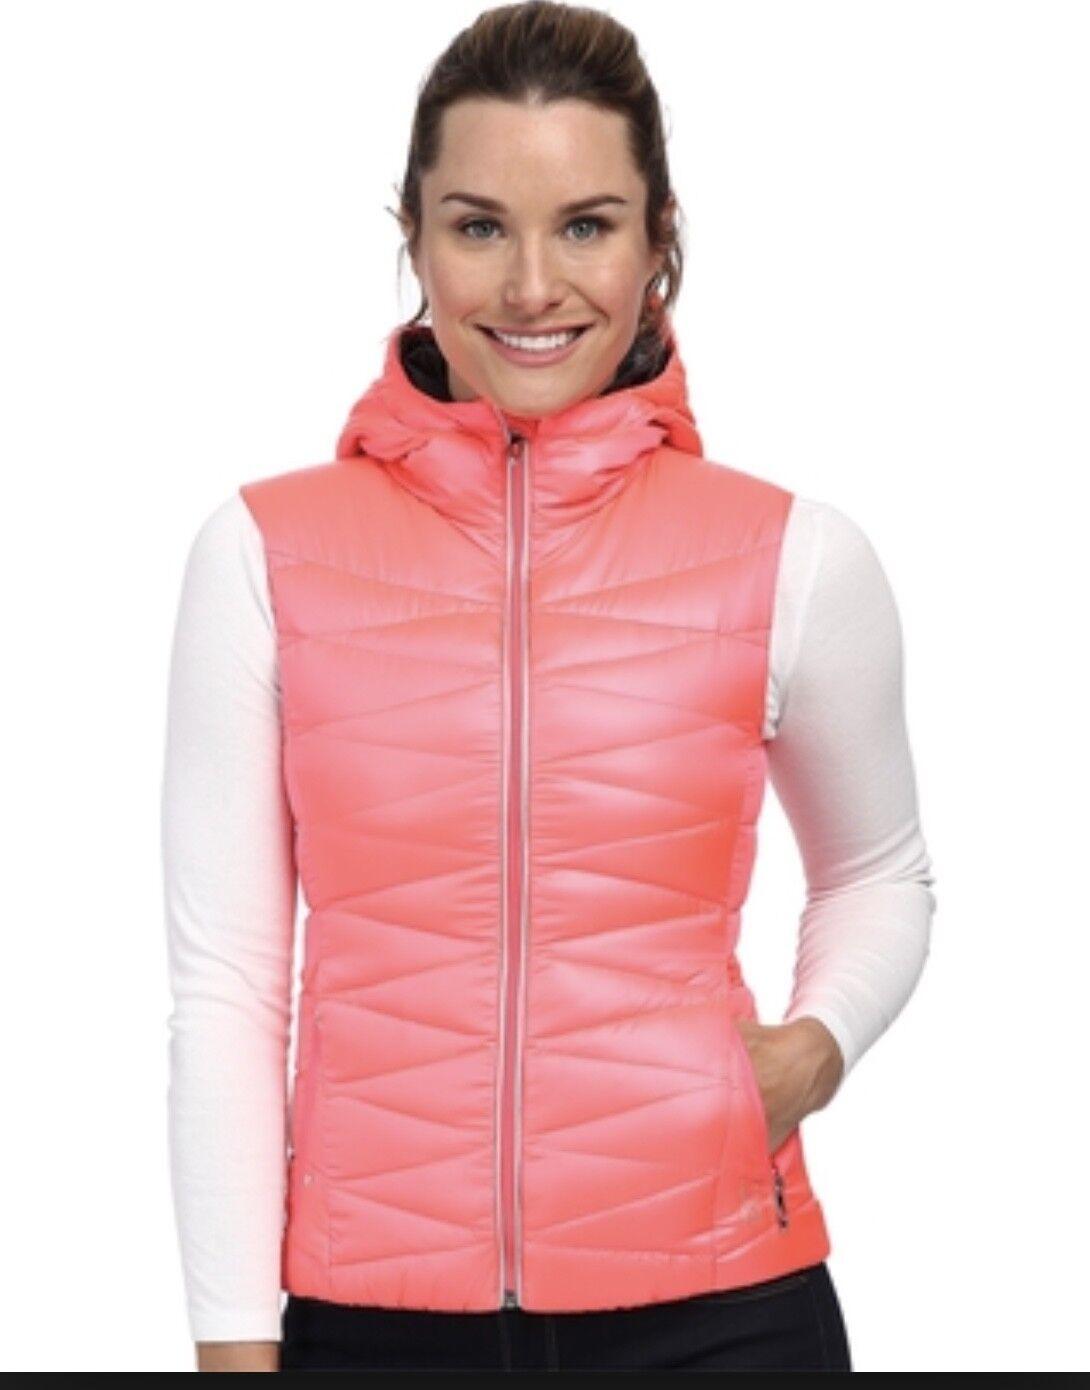 NEW Spyder Timeless Hooded Down Vest - Women's Bright Neon orange Pink  Small